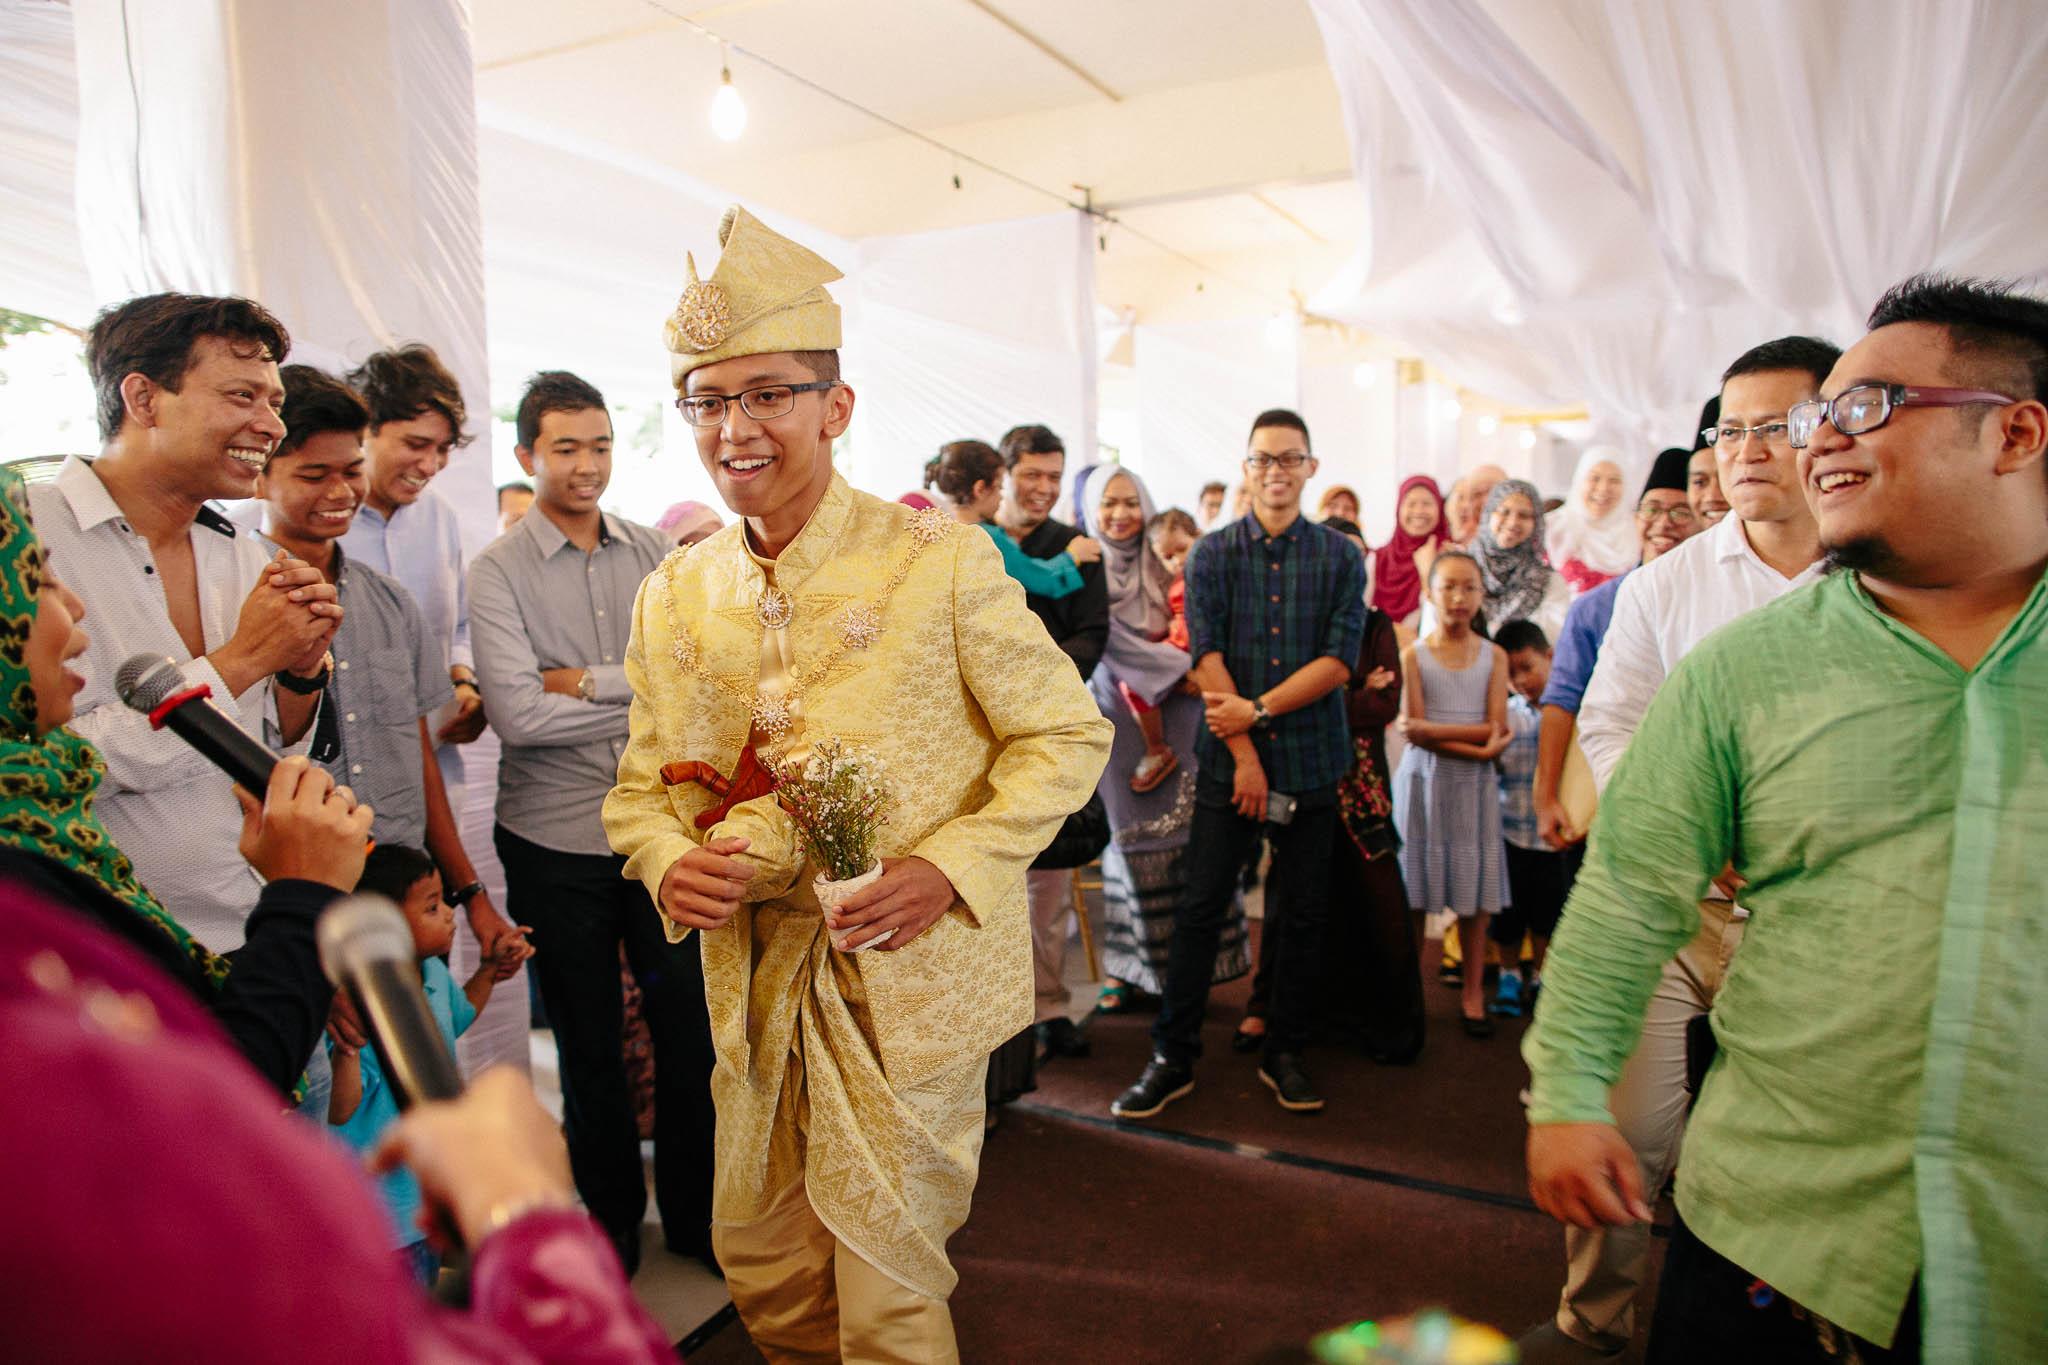 singapore-wedding-photographer-sharalyn-syazwan-034.jpg